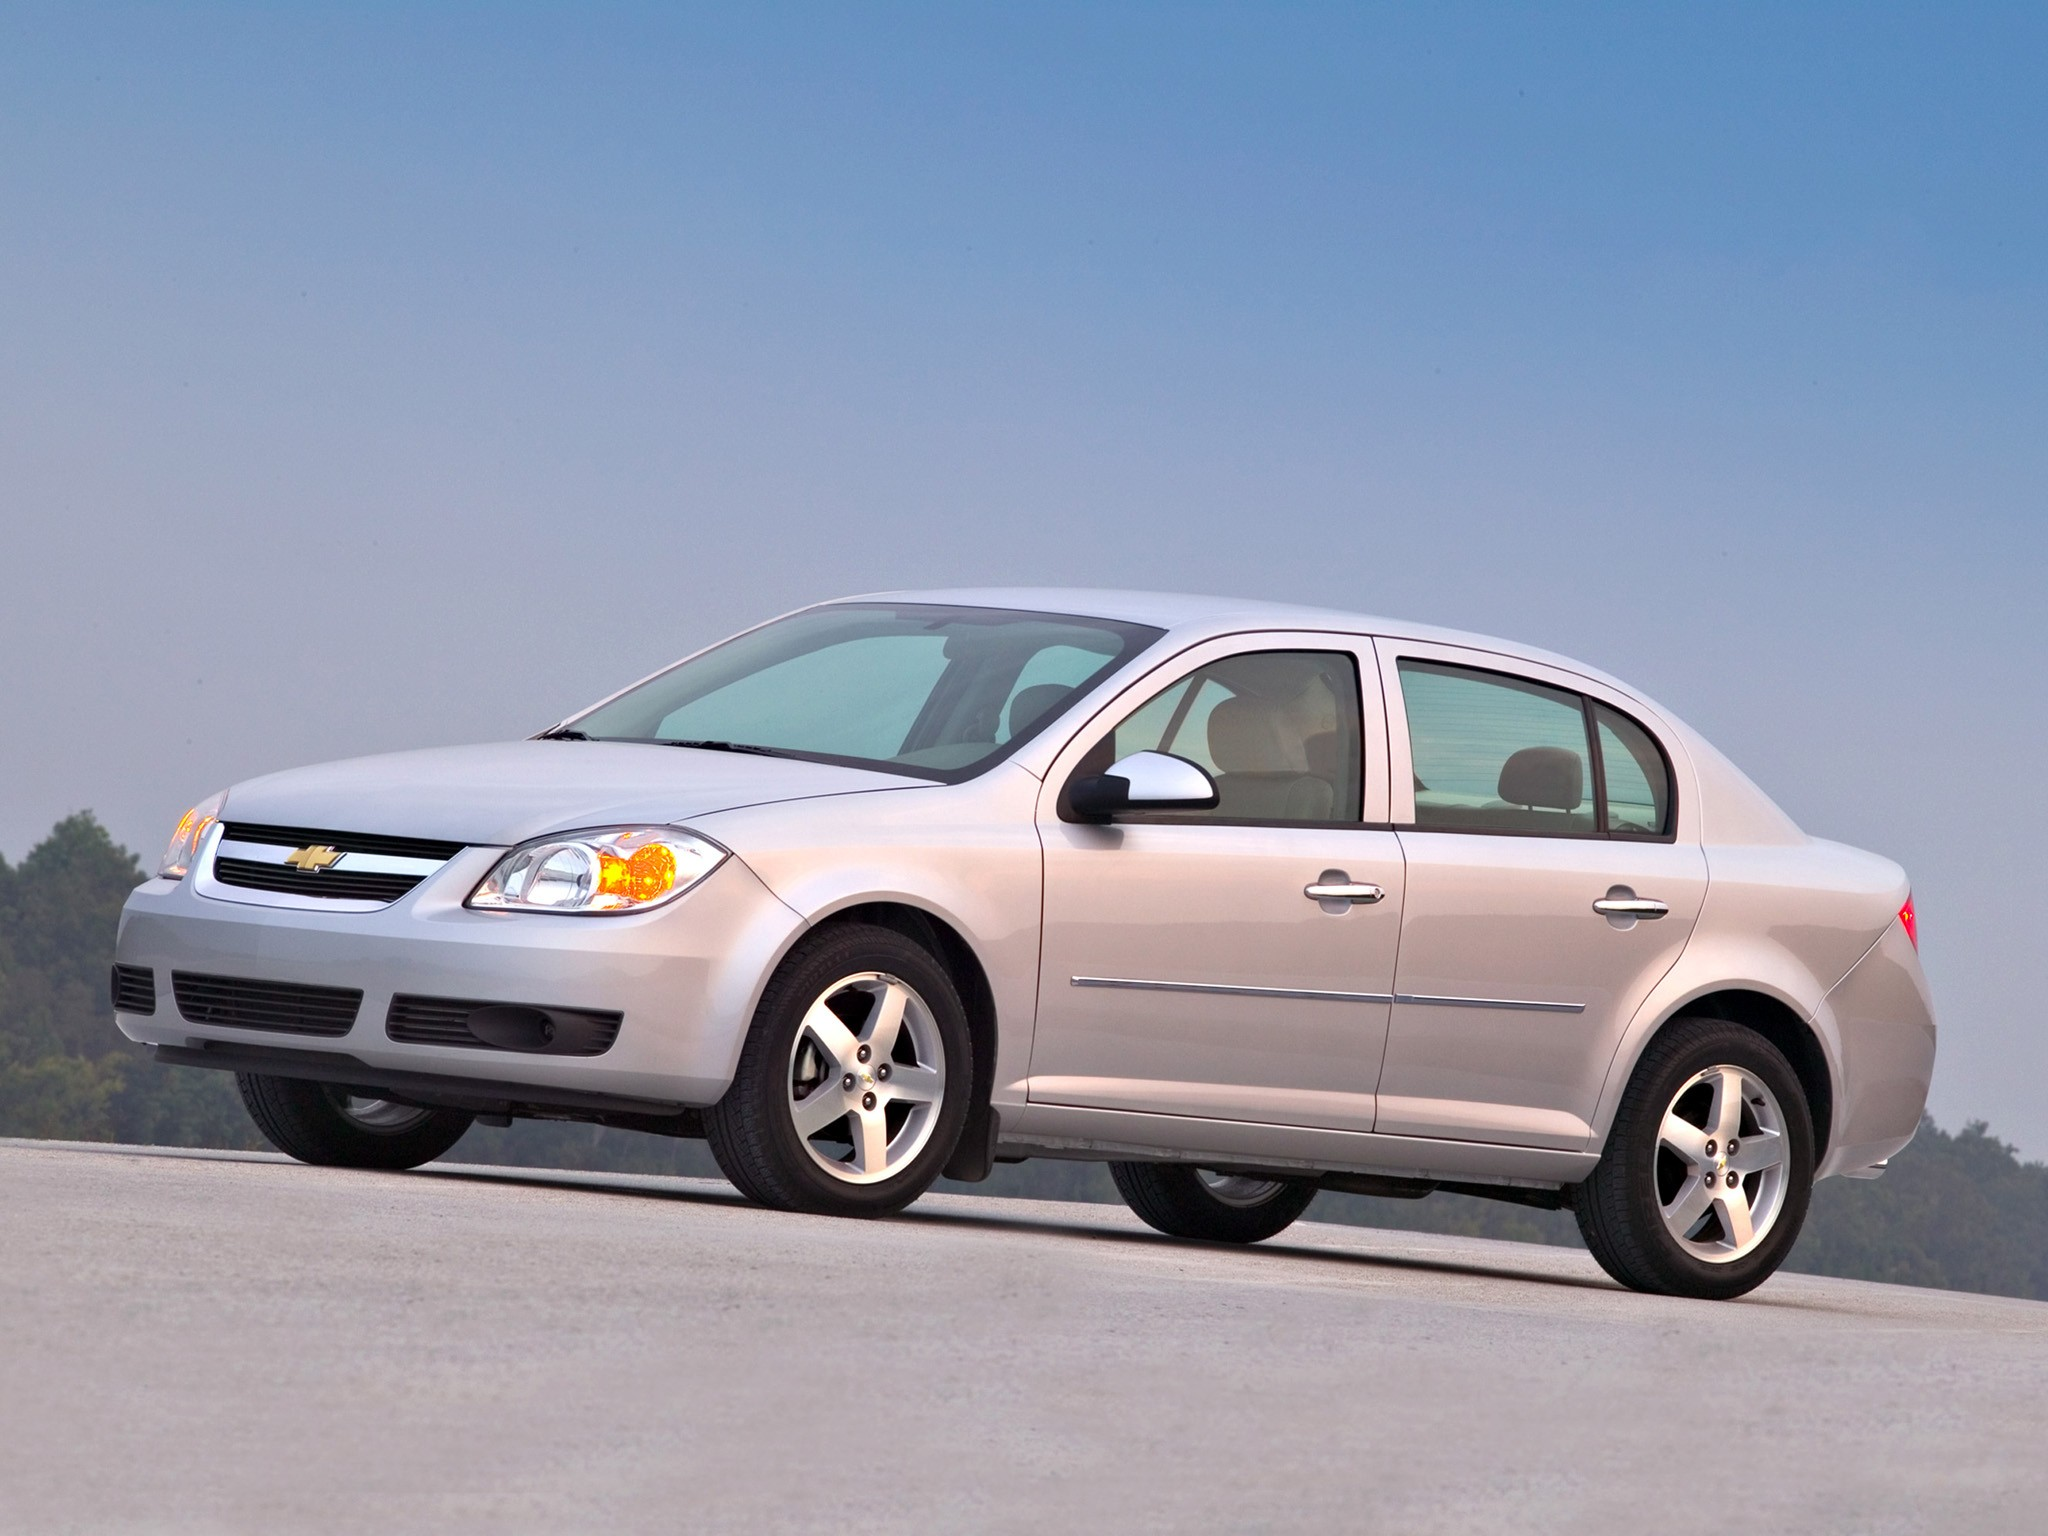 CHEVROLET Cobalt Sedan specs & photos - 2008, 2009, 2010 ...